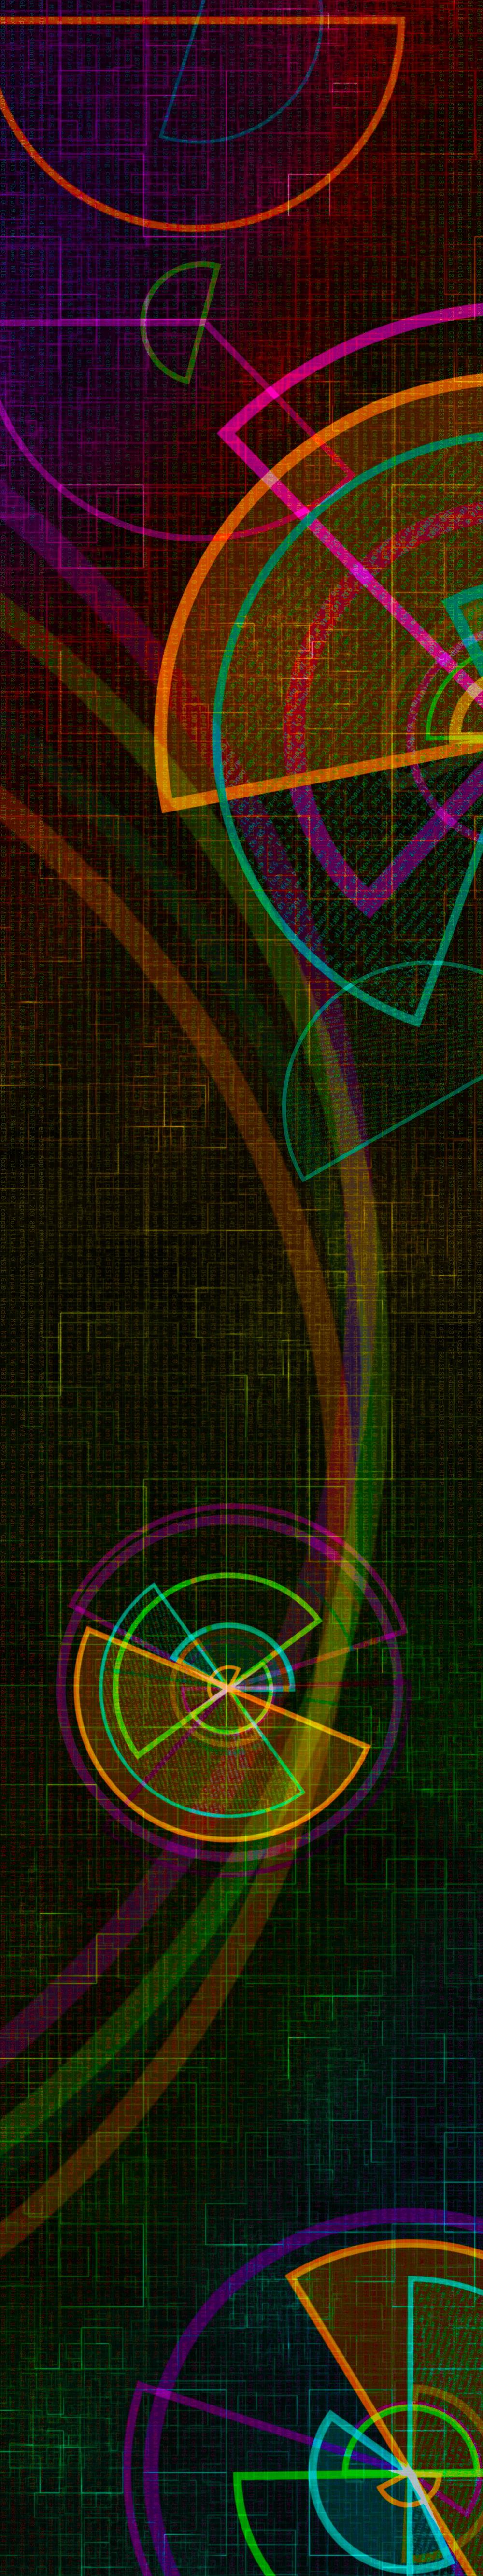 "Splunk .conf18 Event Booth Graphic ""Radar Data """